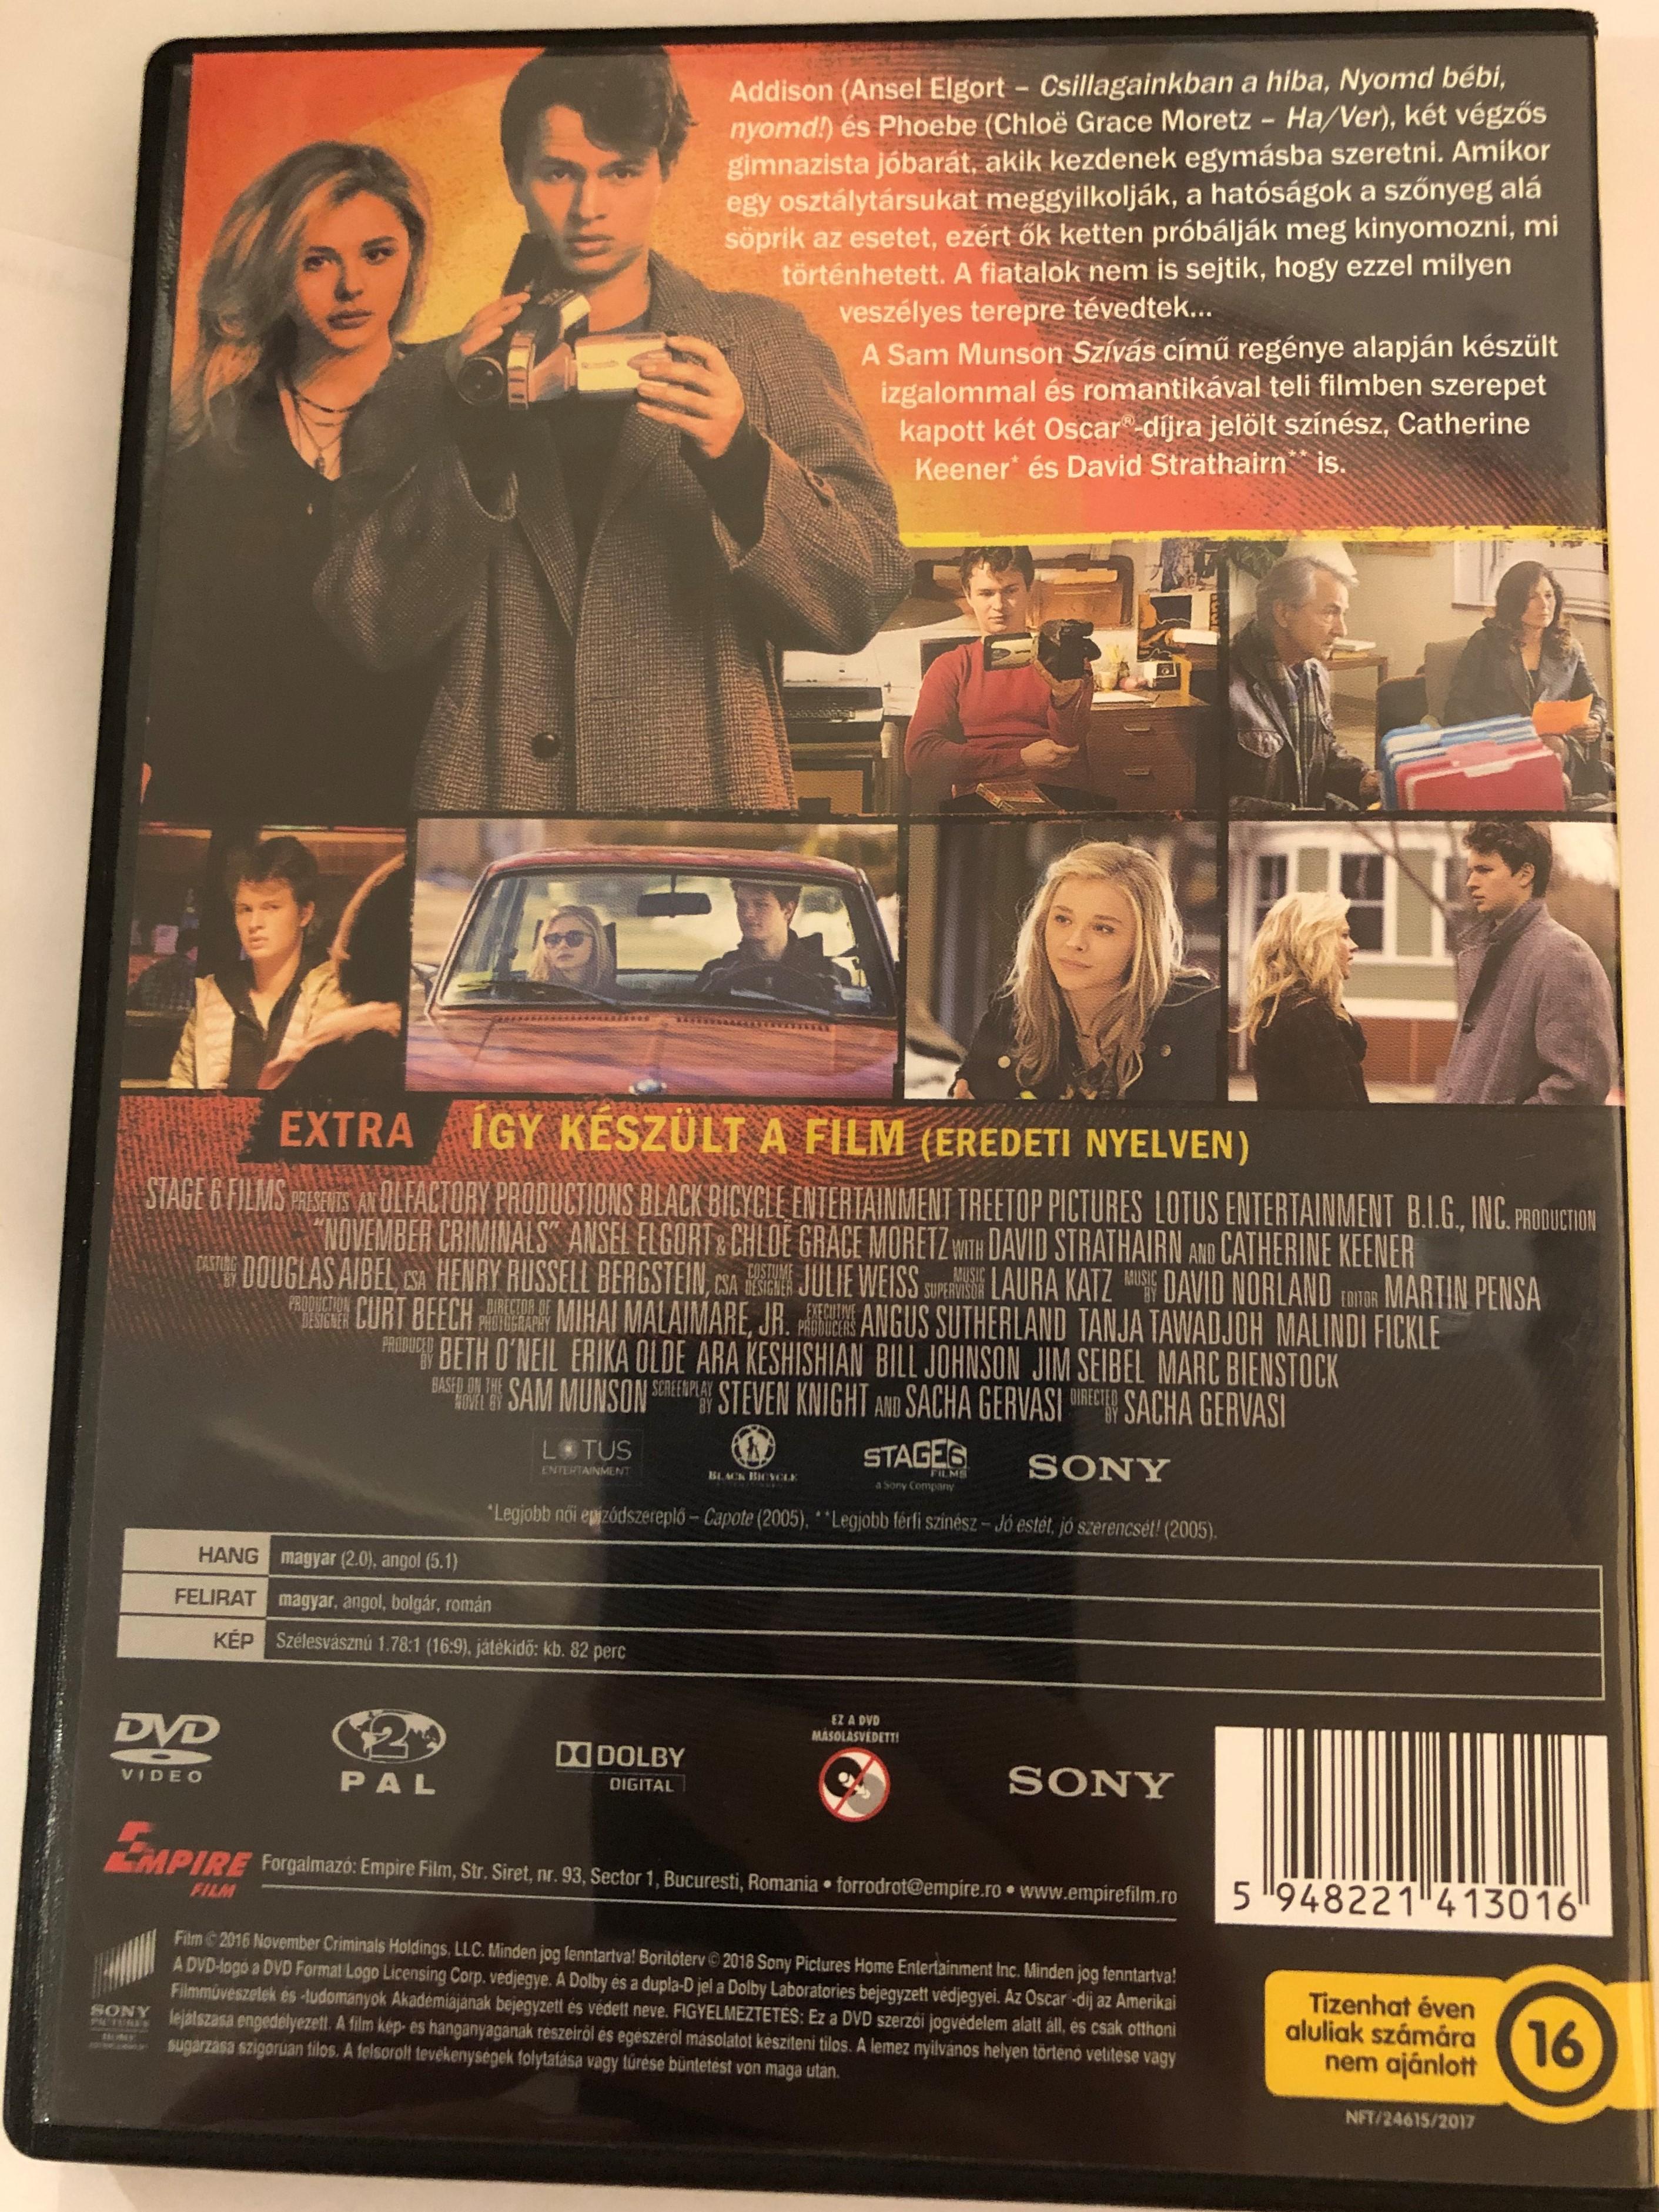 november-criminals-dvd-2017-novemberi-gyilkoss-gok-directed-by-sacha-gervasi-2.jpg